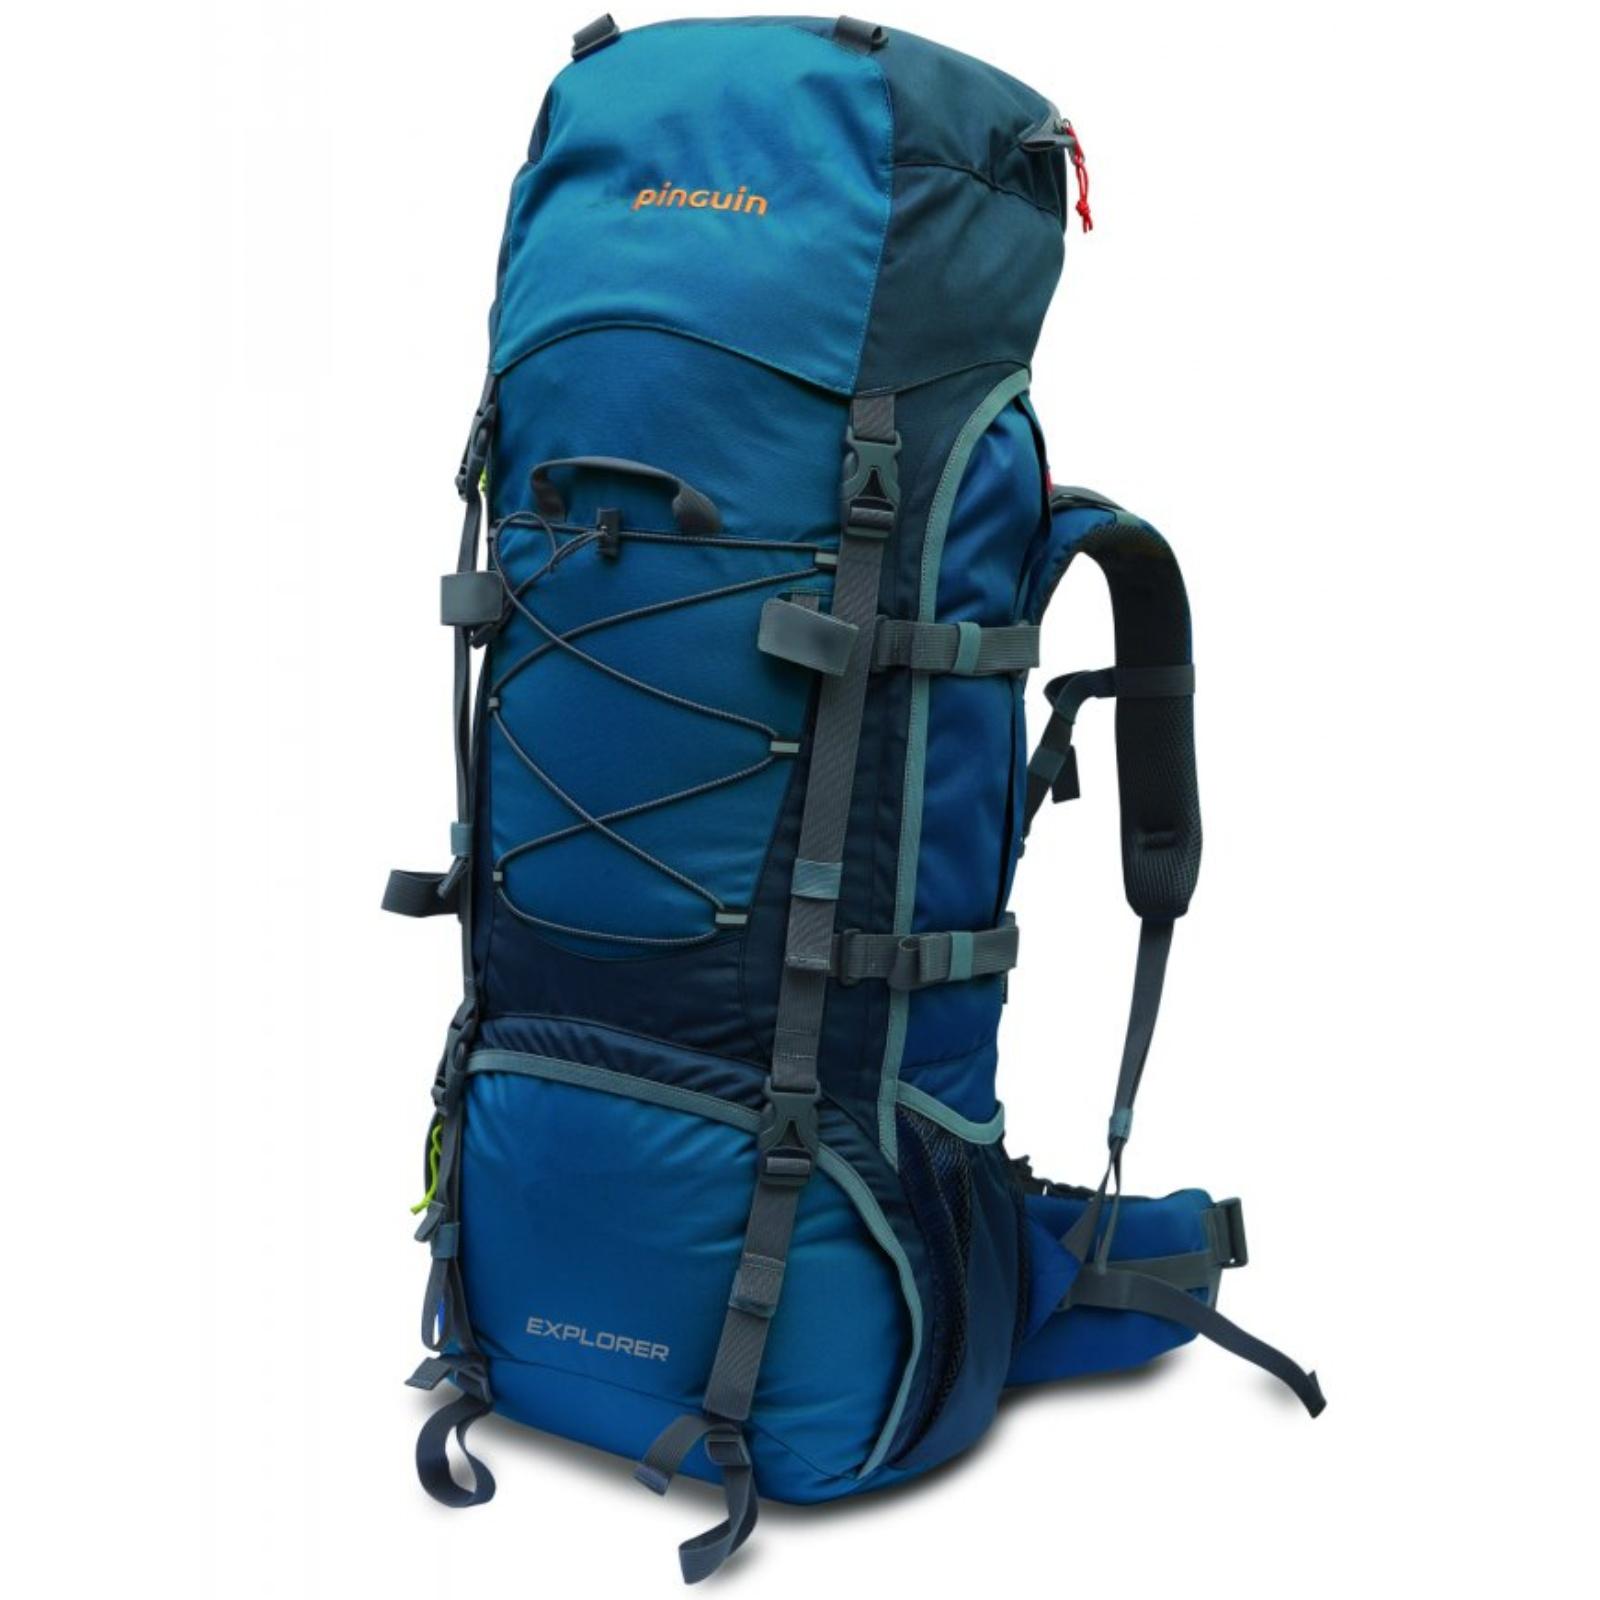 Batoh PINGUIN Explorer 60 modrý